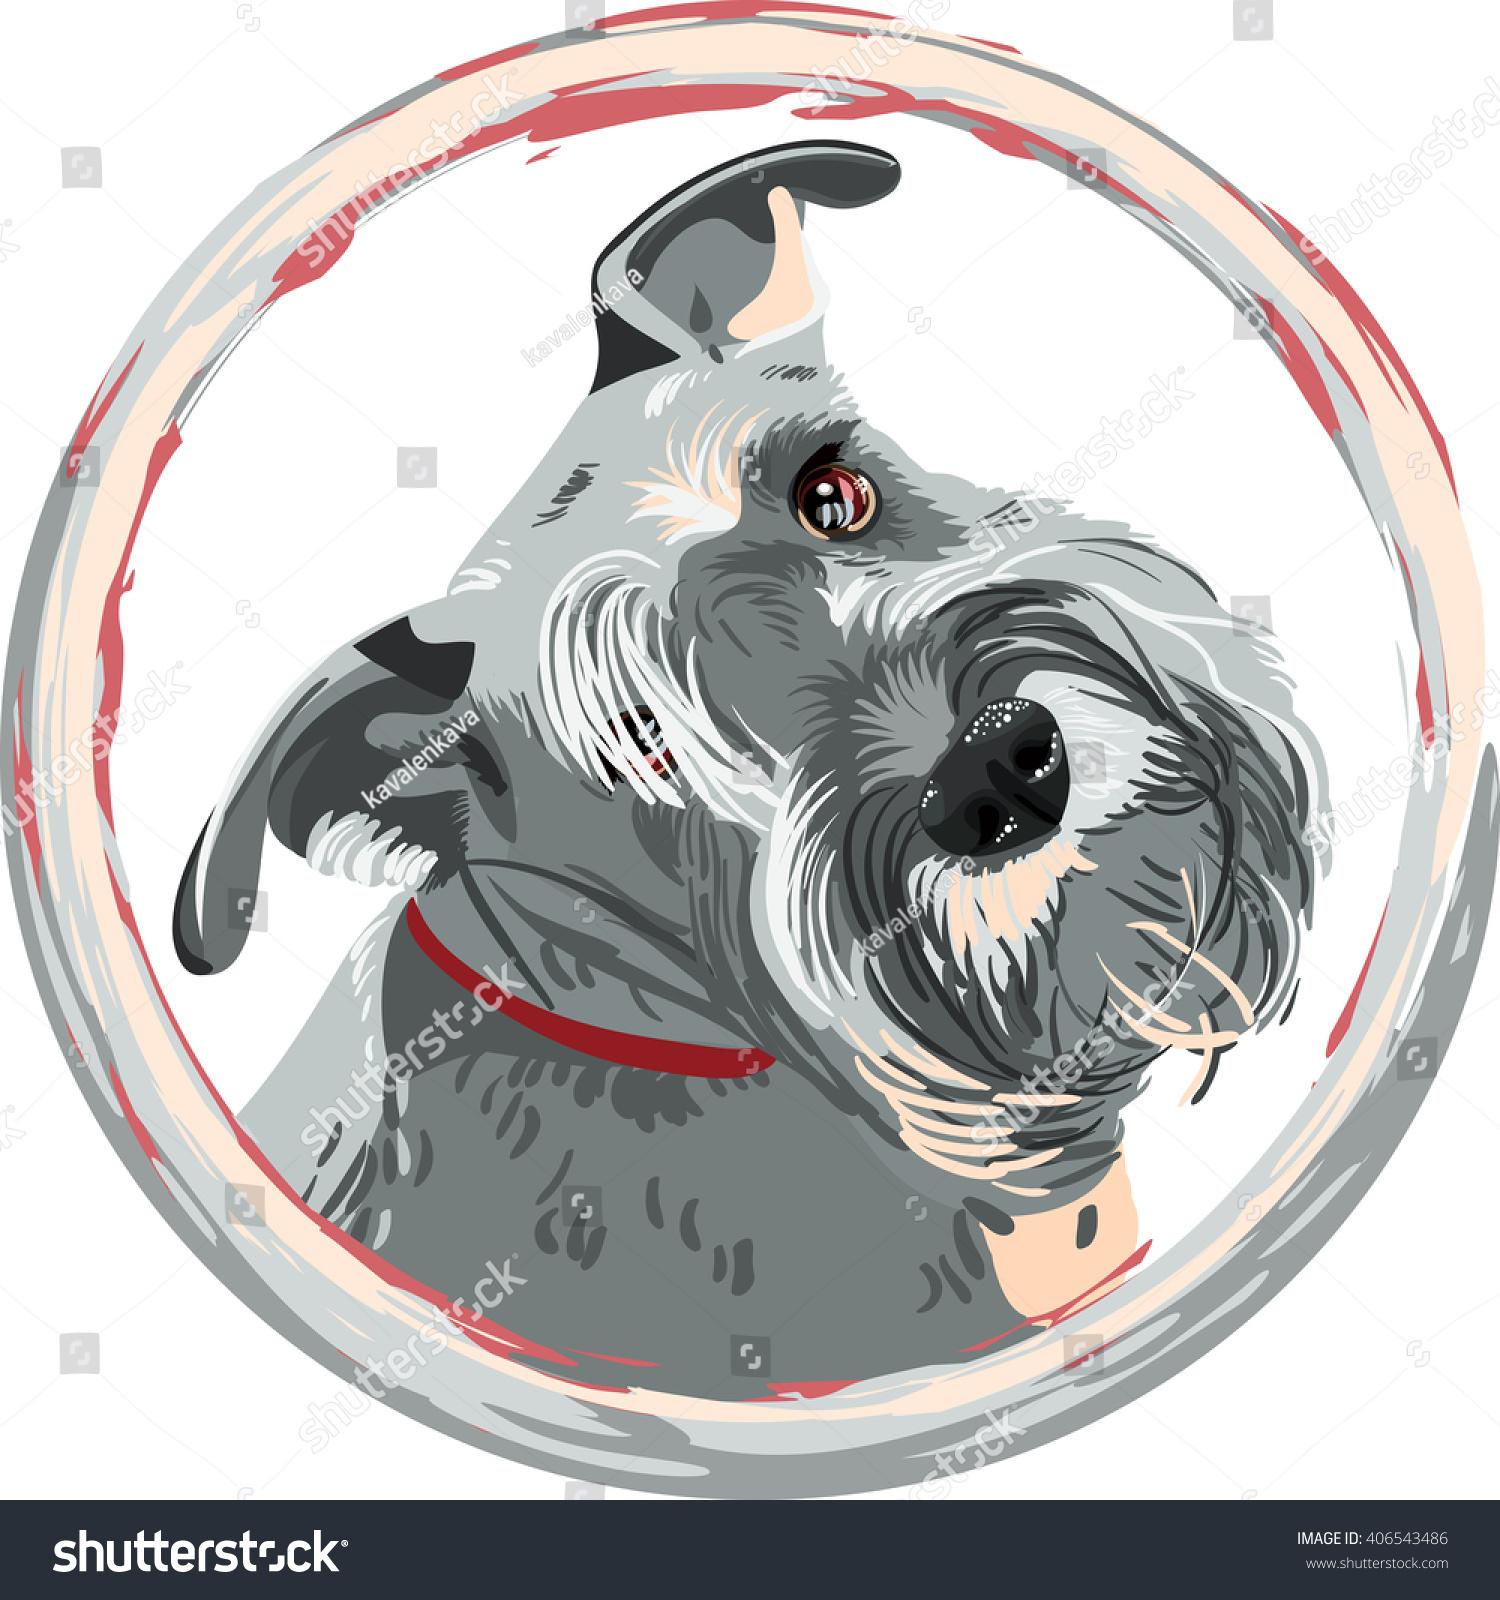 Dog Breed Bearded Miniature Schnauzer Color Vector de stock406543486 ...